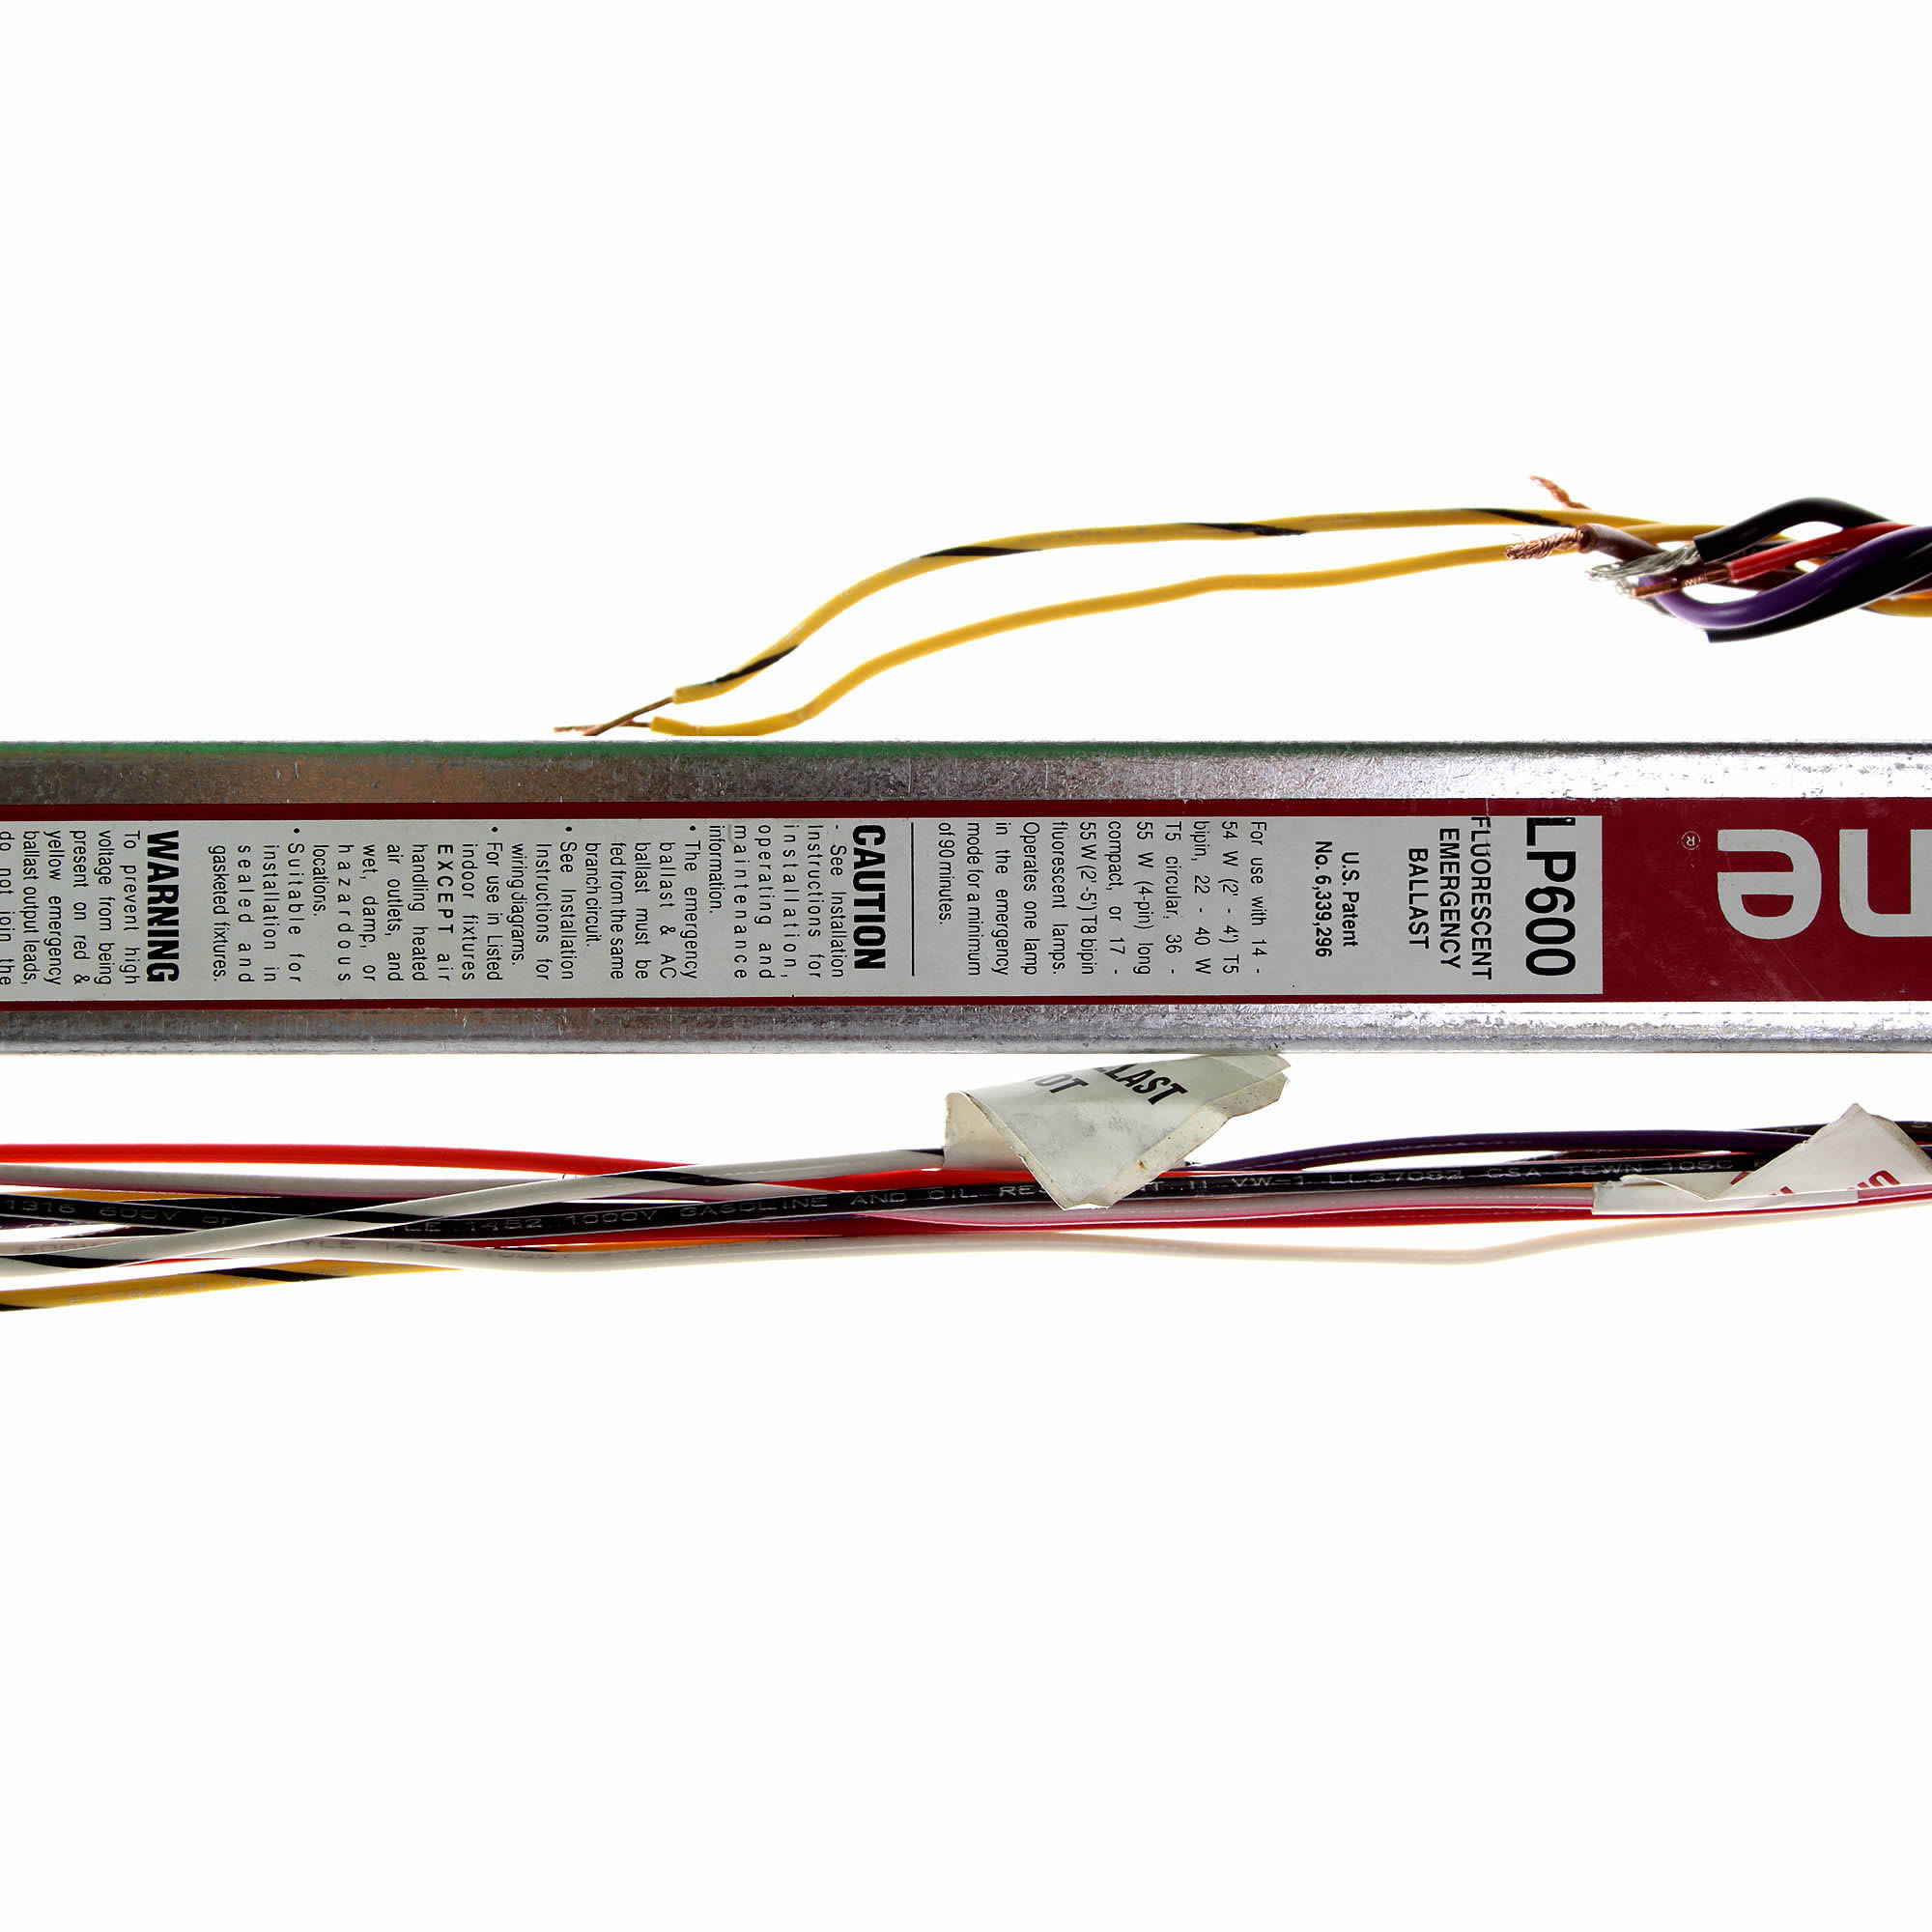 hight resolution of bodine lp600 linear fluorescent emergency ballast walmart combodine lp600 emergency ballast wiring diagram 14